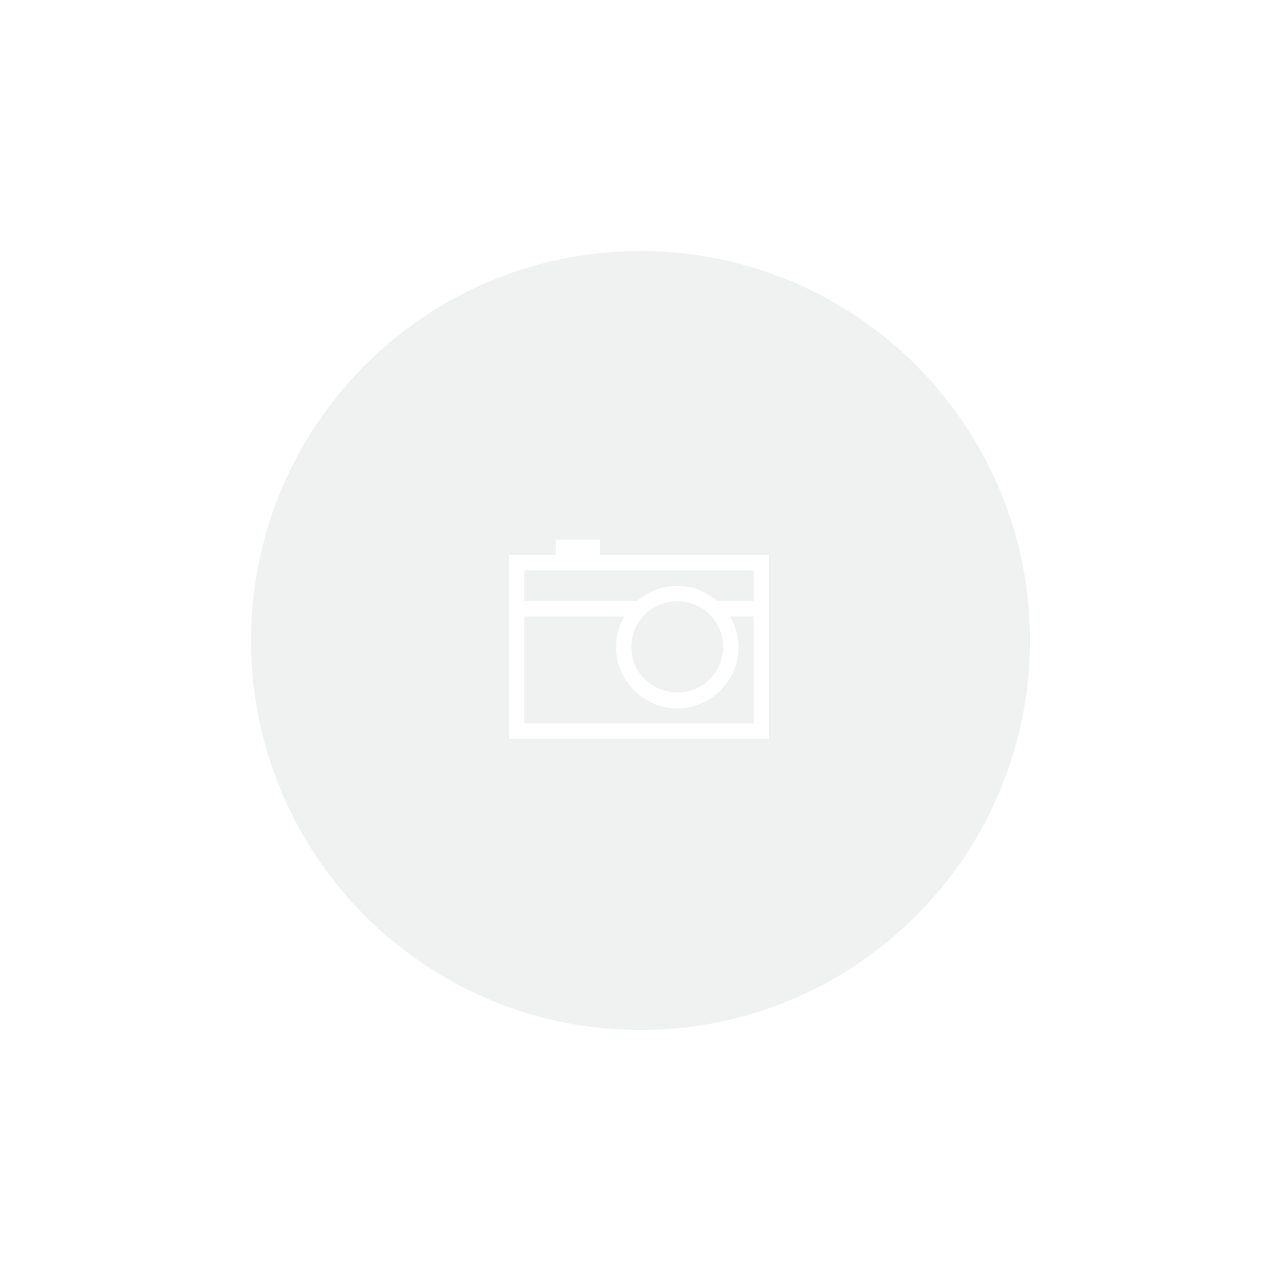 Conjunto de Panelas em Inox 5 Peças Allegra Tramontina